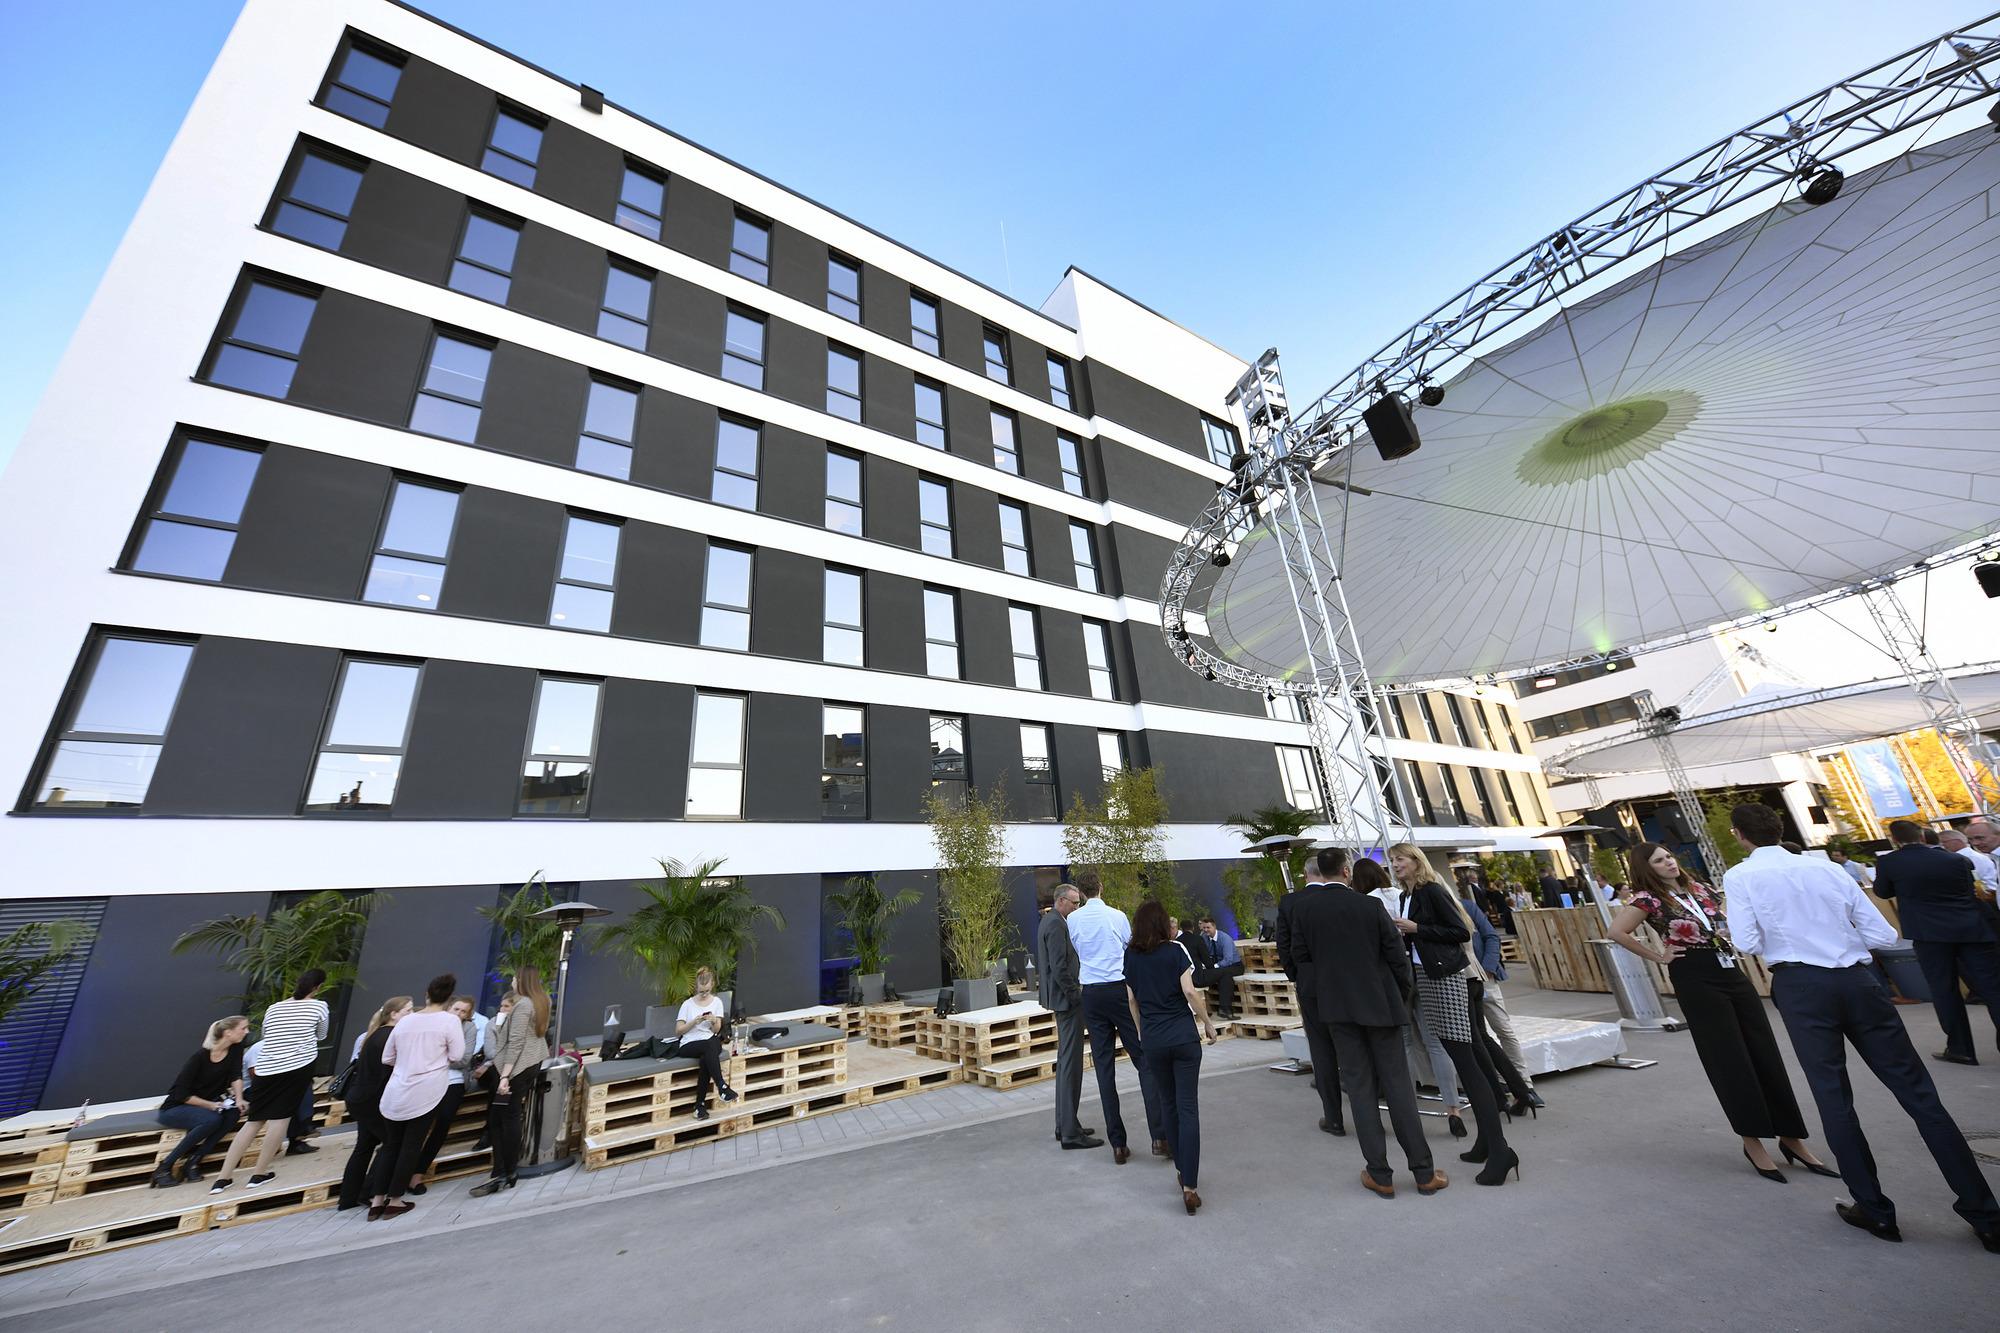 Bilfinger in Mannheim: Neues Hauptquartier symbolisiert Neuanfang ...